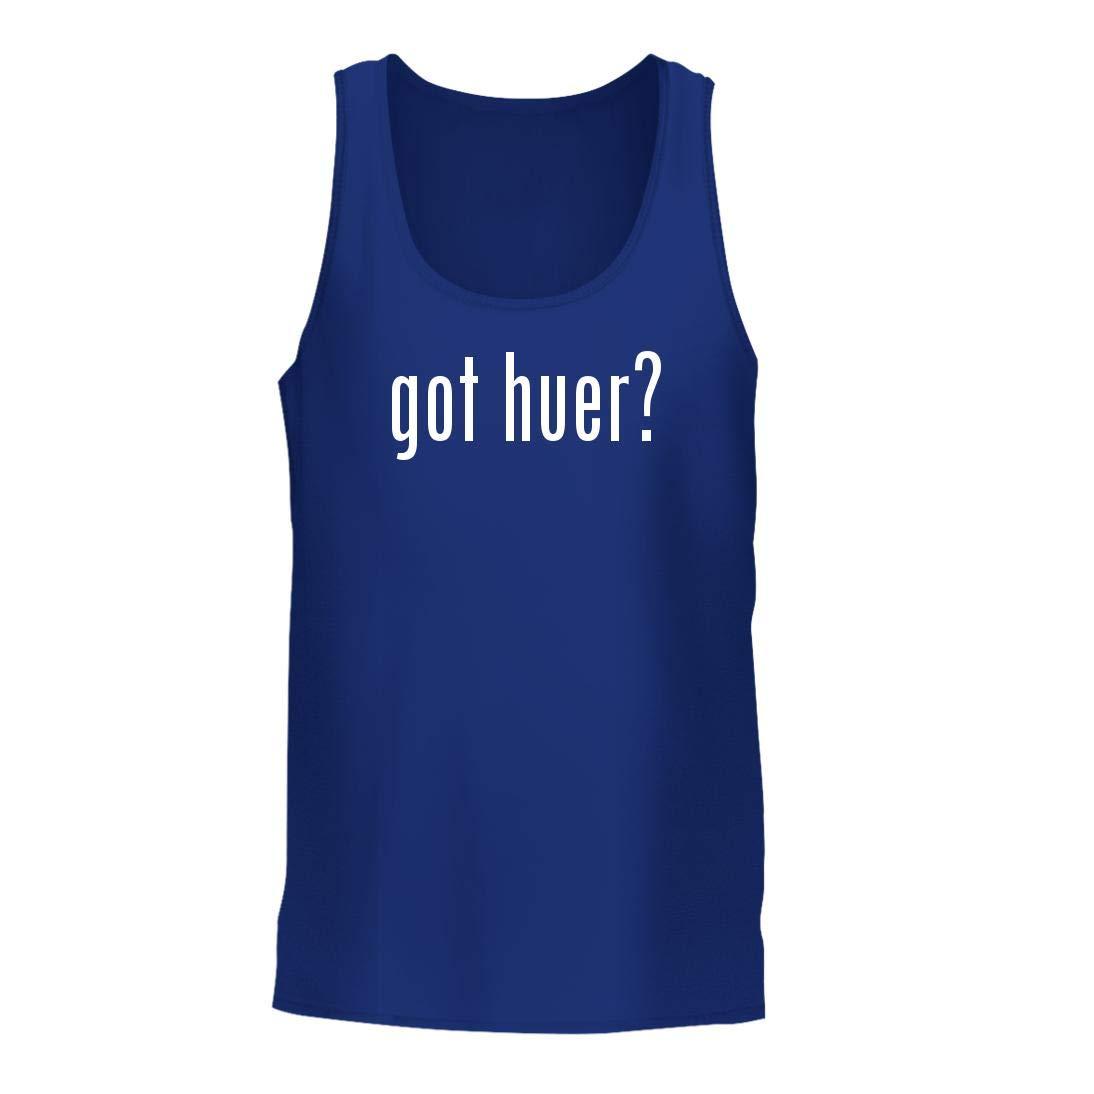 got Huer? - A Nice Men's Tank Top, Blue, Large by Shirt Me Up